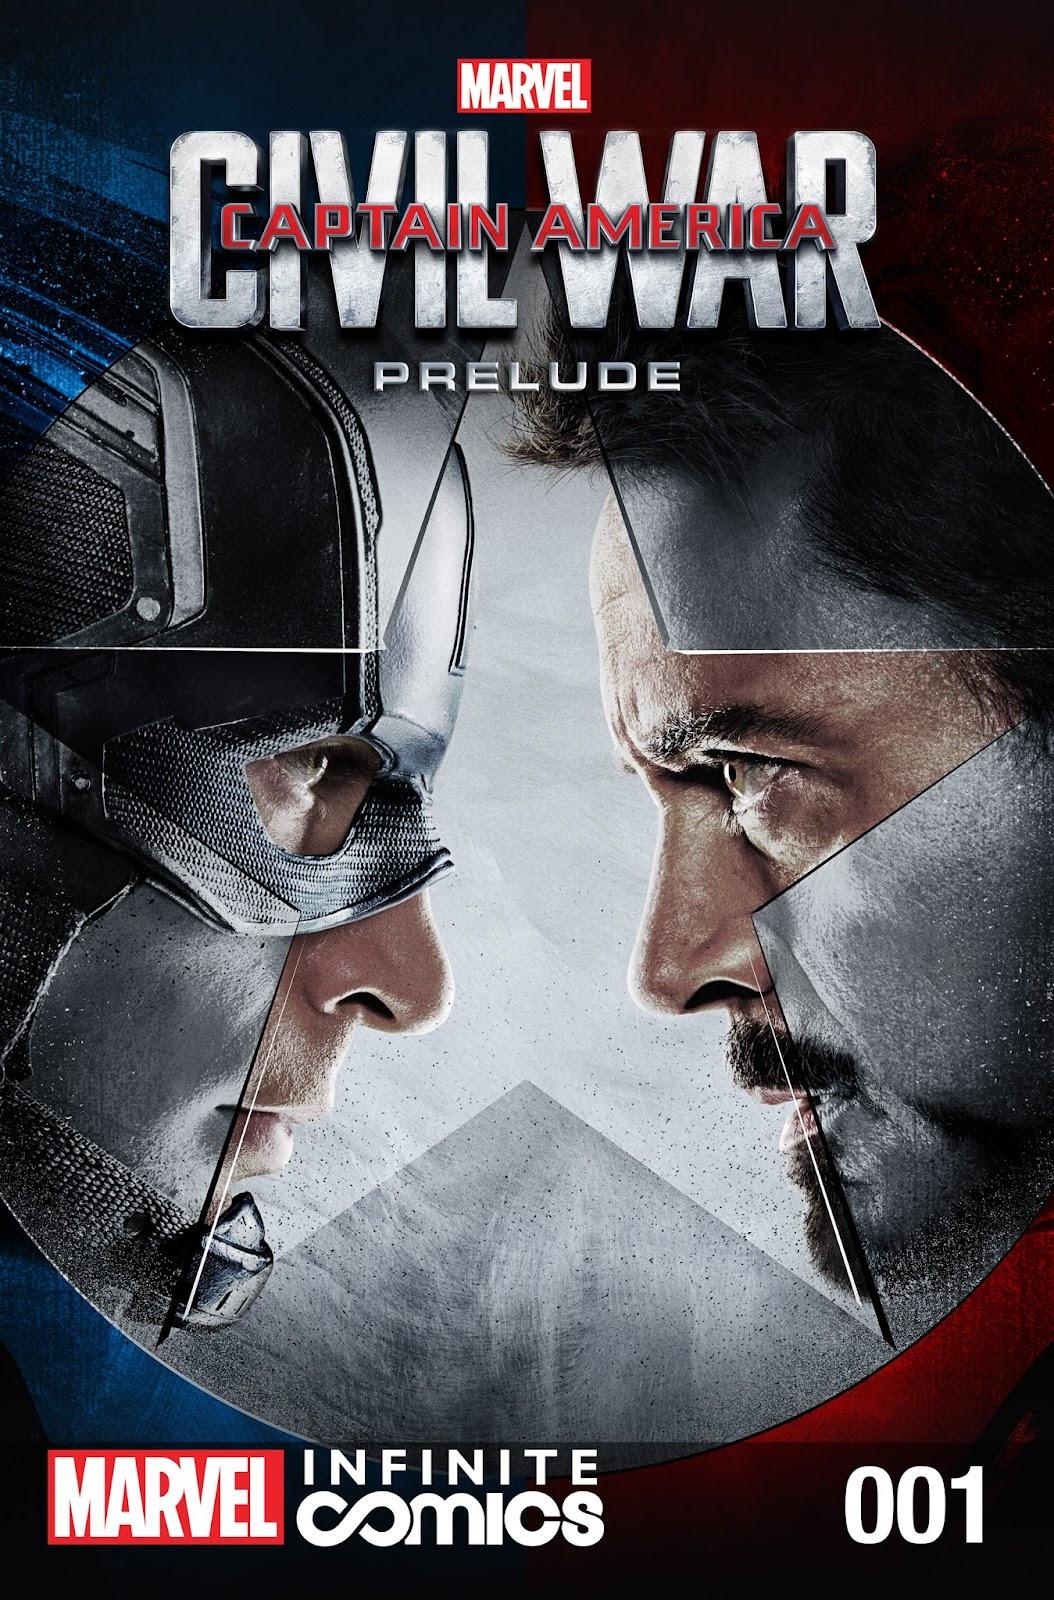 Read online Captain America: Civil War Prelude (Infinite Comics) comic -  Issue # Full - 1